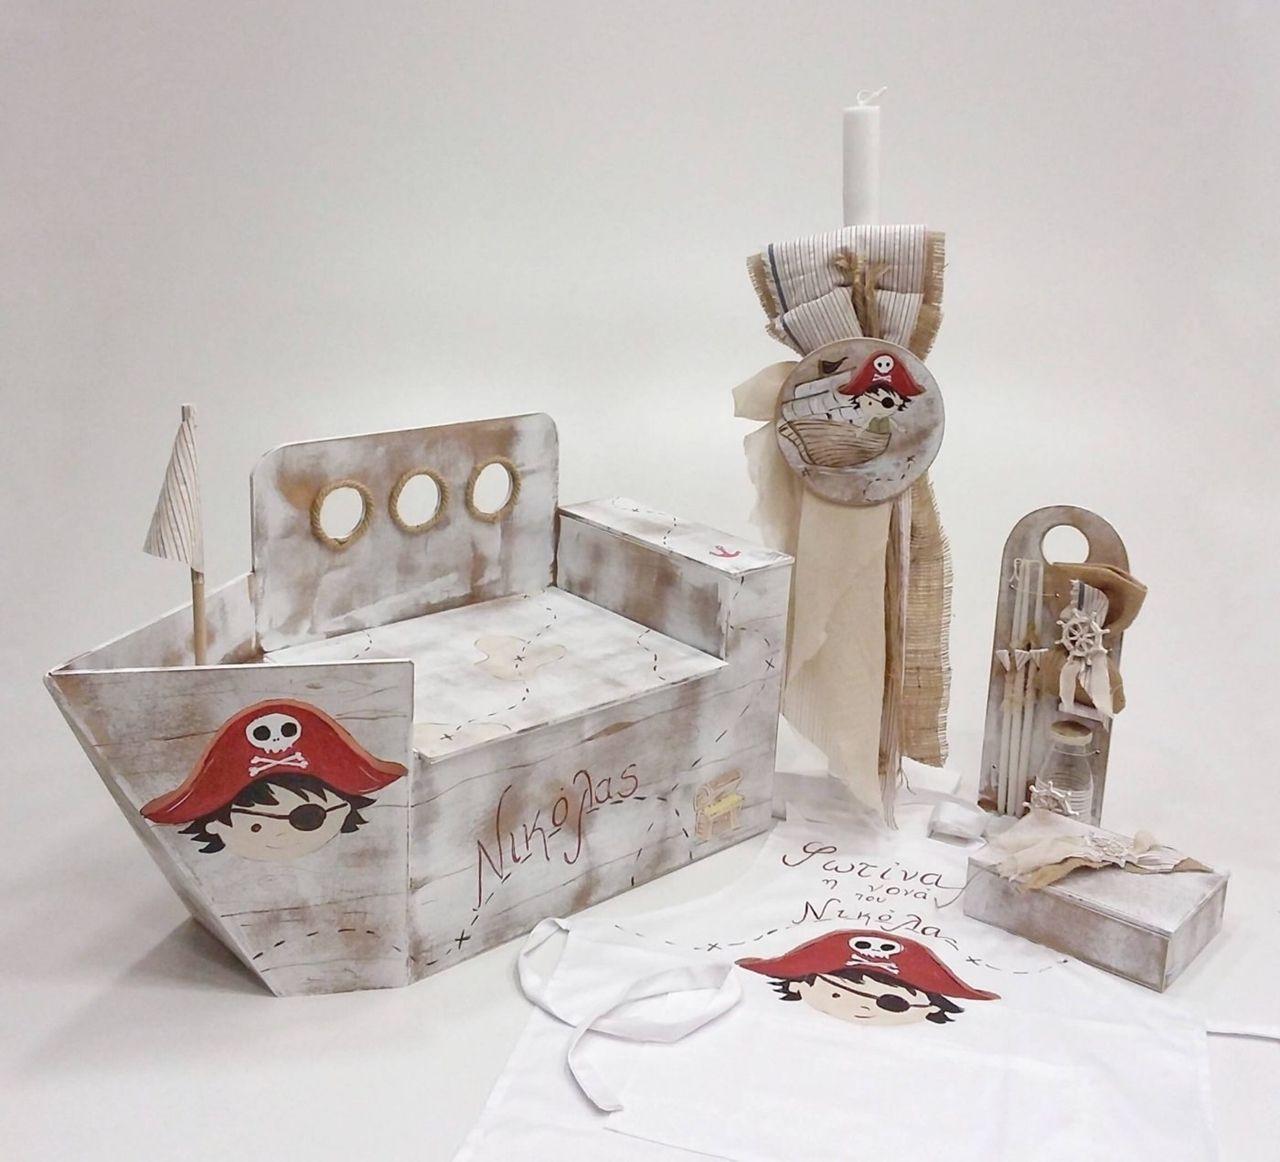 683d7678f0c κουτί βαπτιστικό καράβι πειρατικό,με λαμπάδα ,λαδοσέτ,ποδιά για τους νονούς  και κουτί